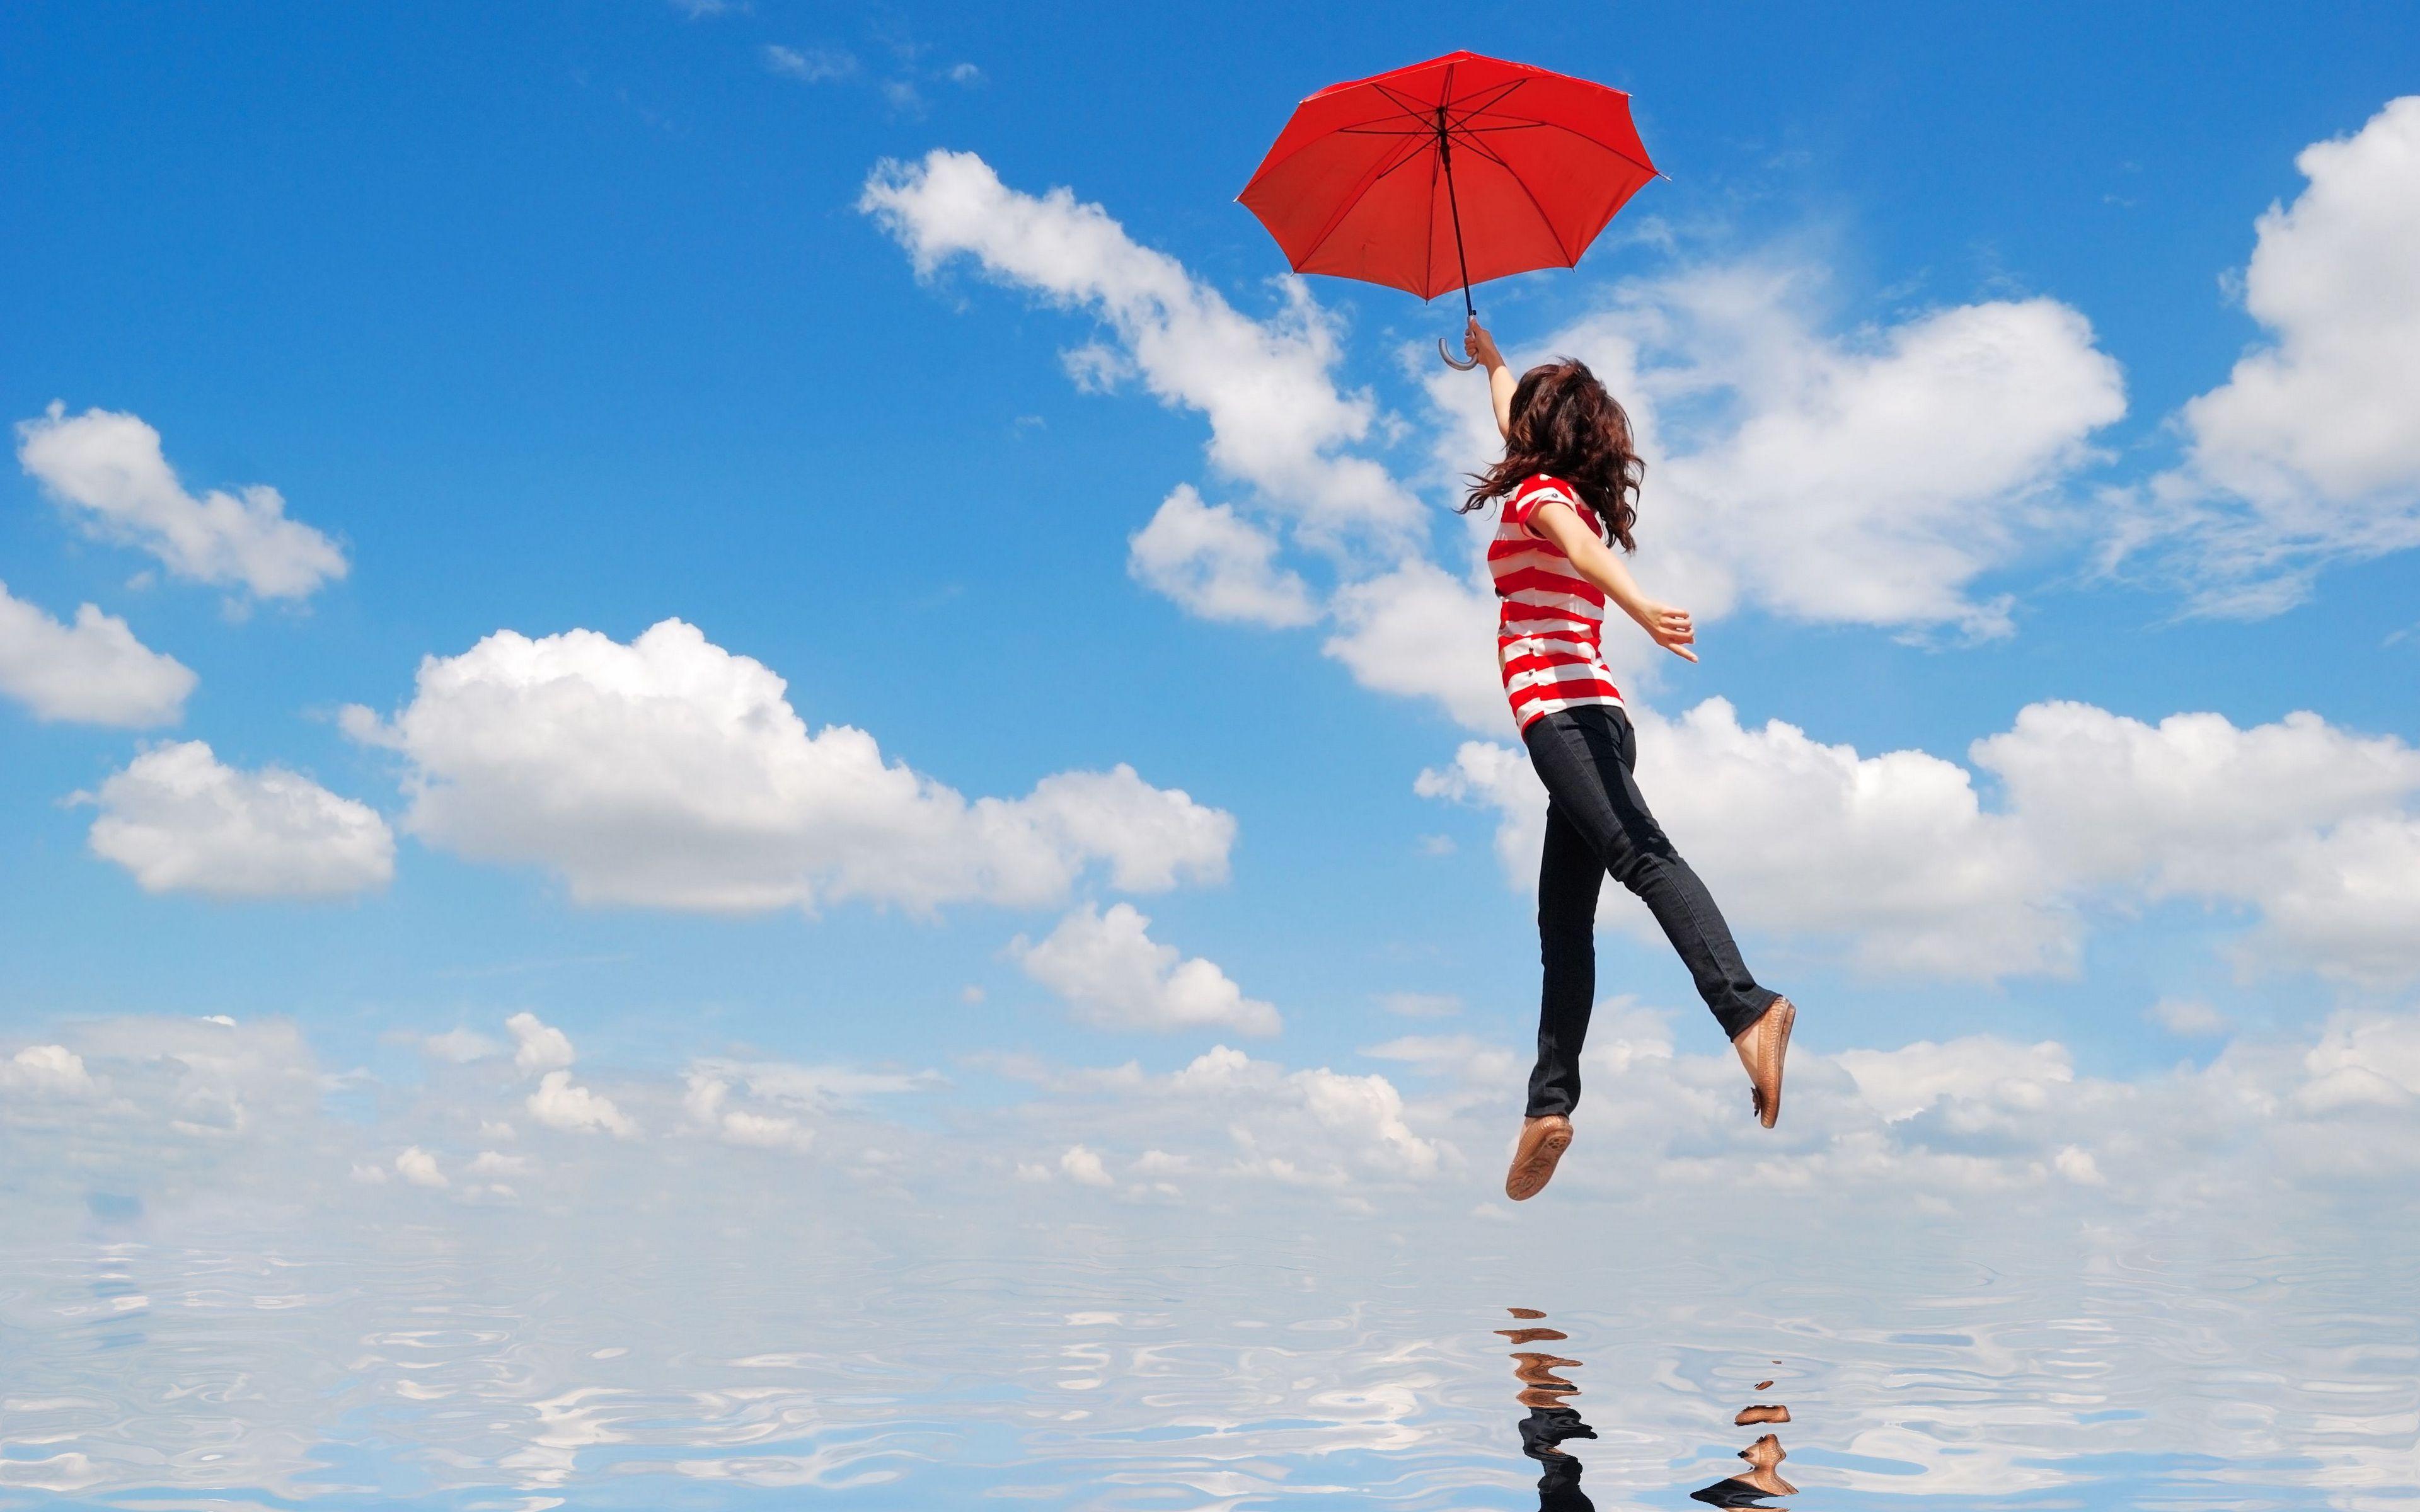 girl_water_flying_umbrella_mood_54532_3840x2400